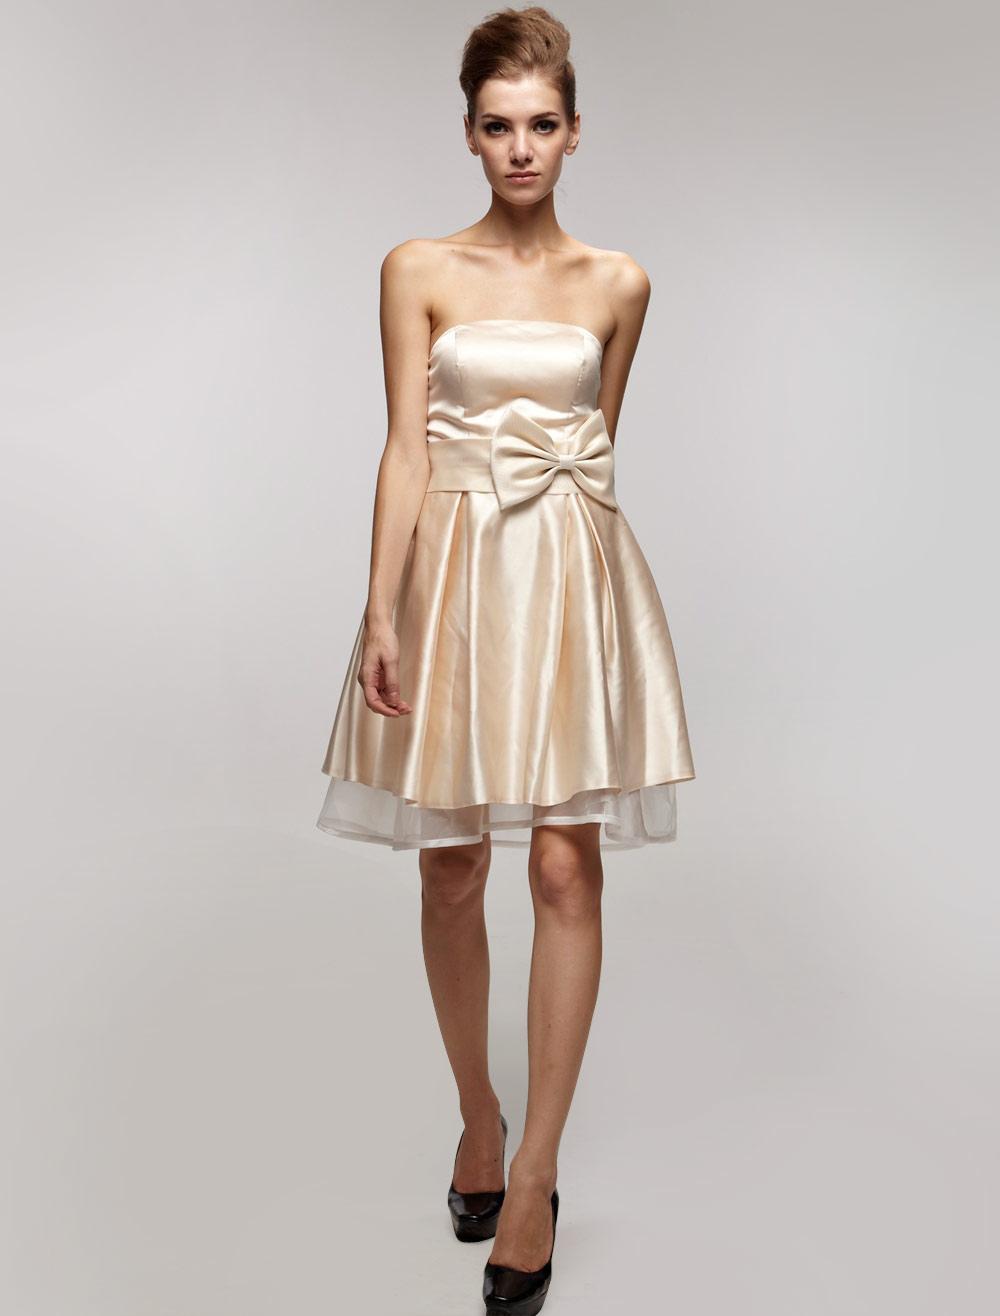 Gold Champagne Bridesmaid Dress Strapless Sash Bows Satin Dress (Wedding Bridesmaid Dresses) photo